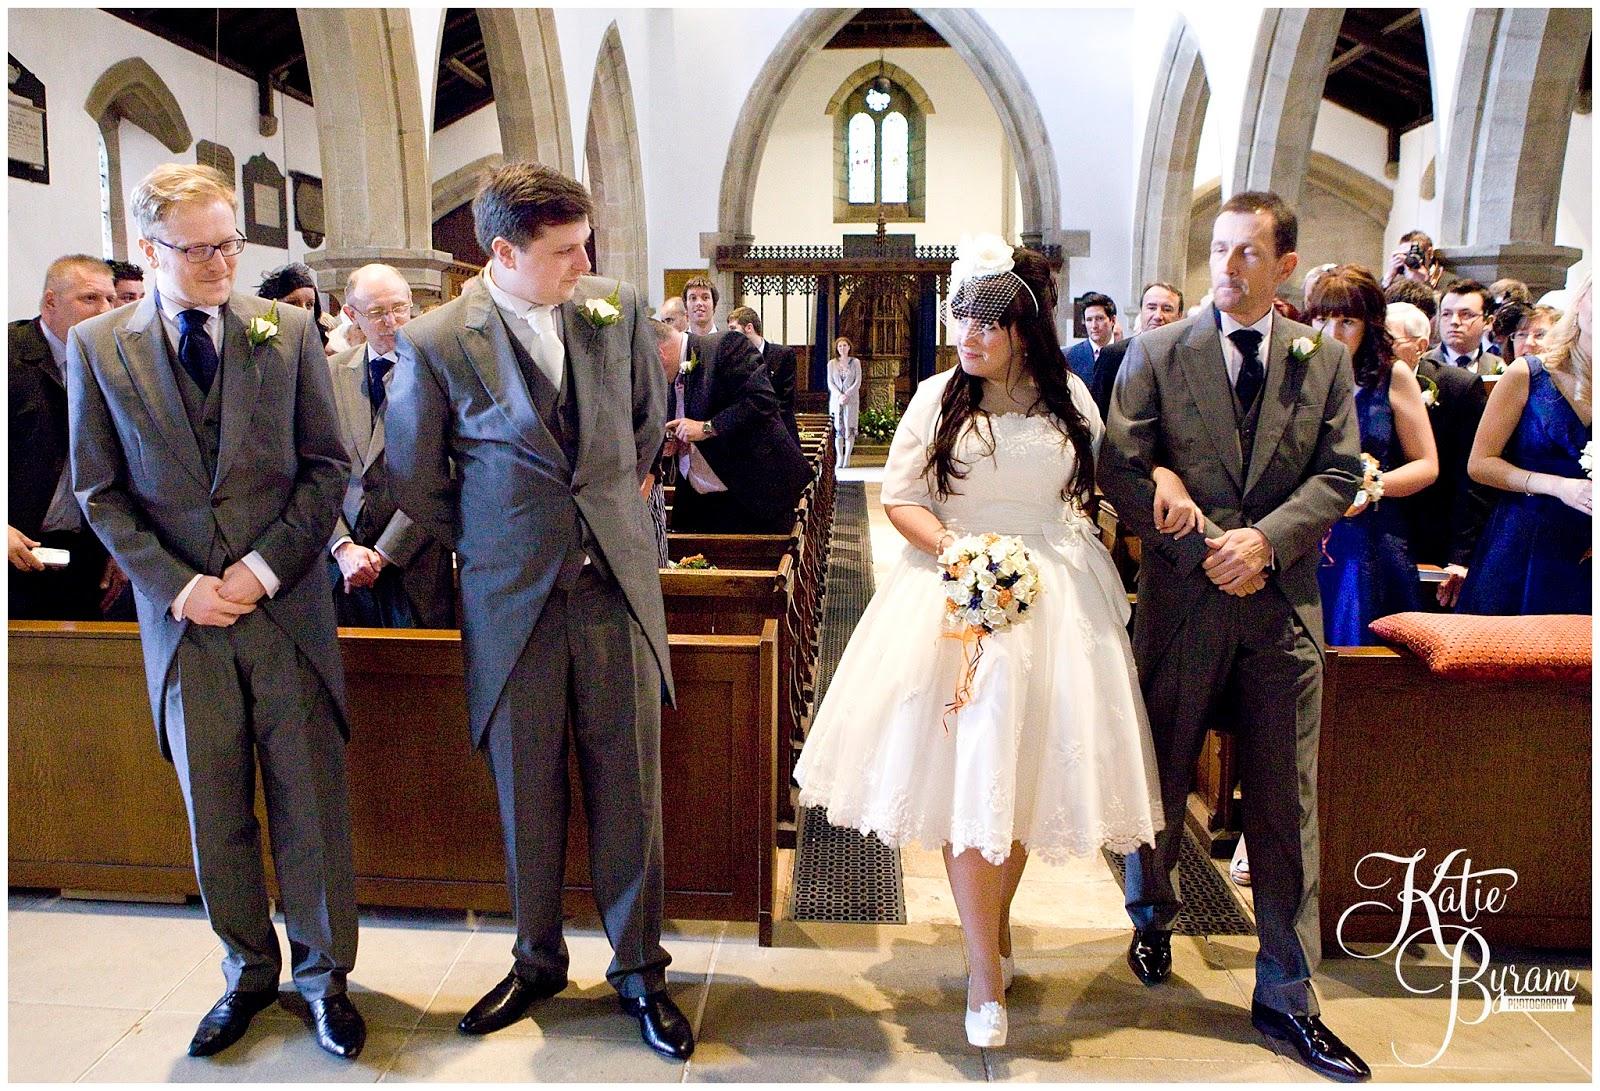 rothbury wedding, share the honest love, love my dress blog, katie byram photography